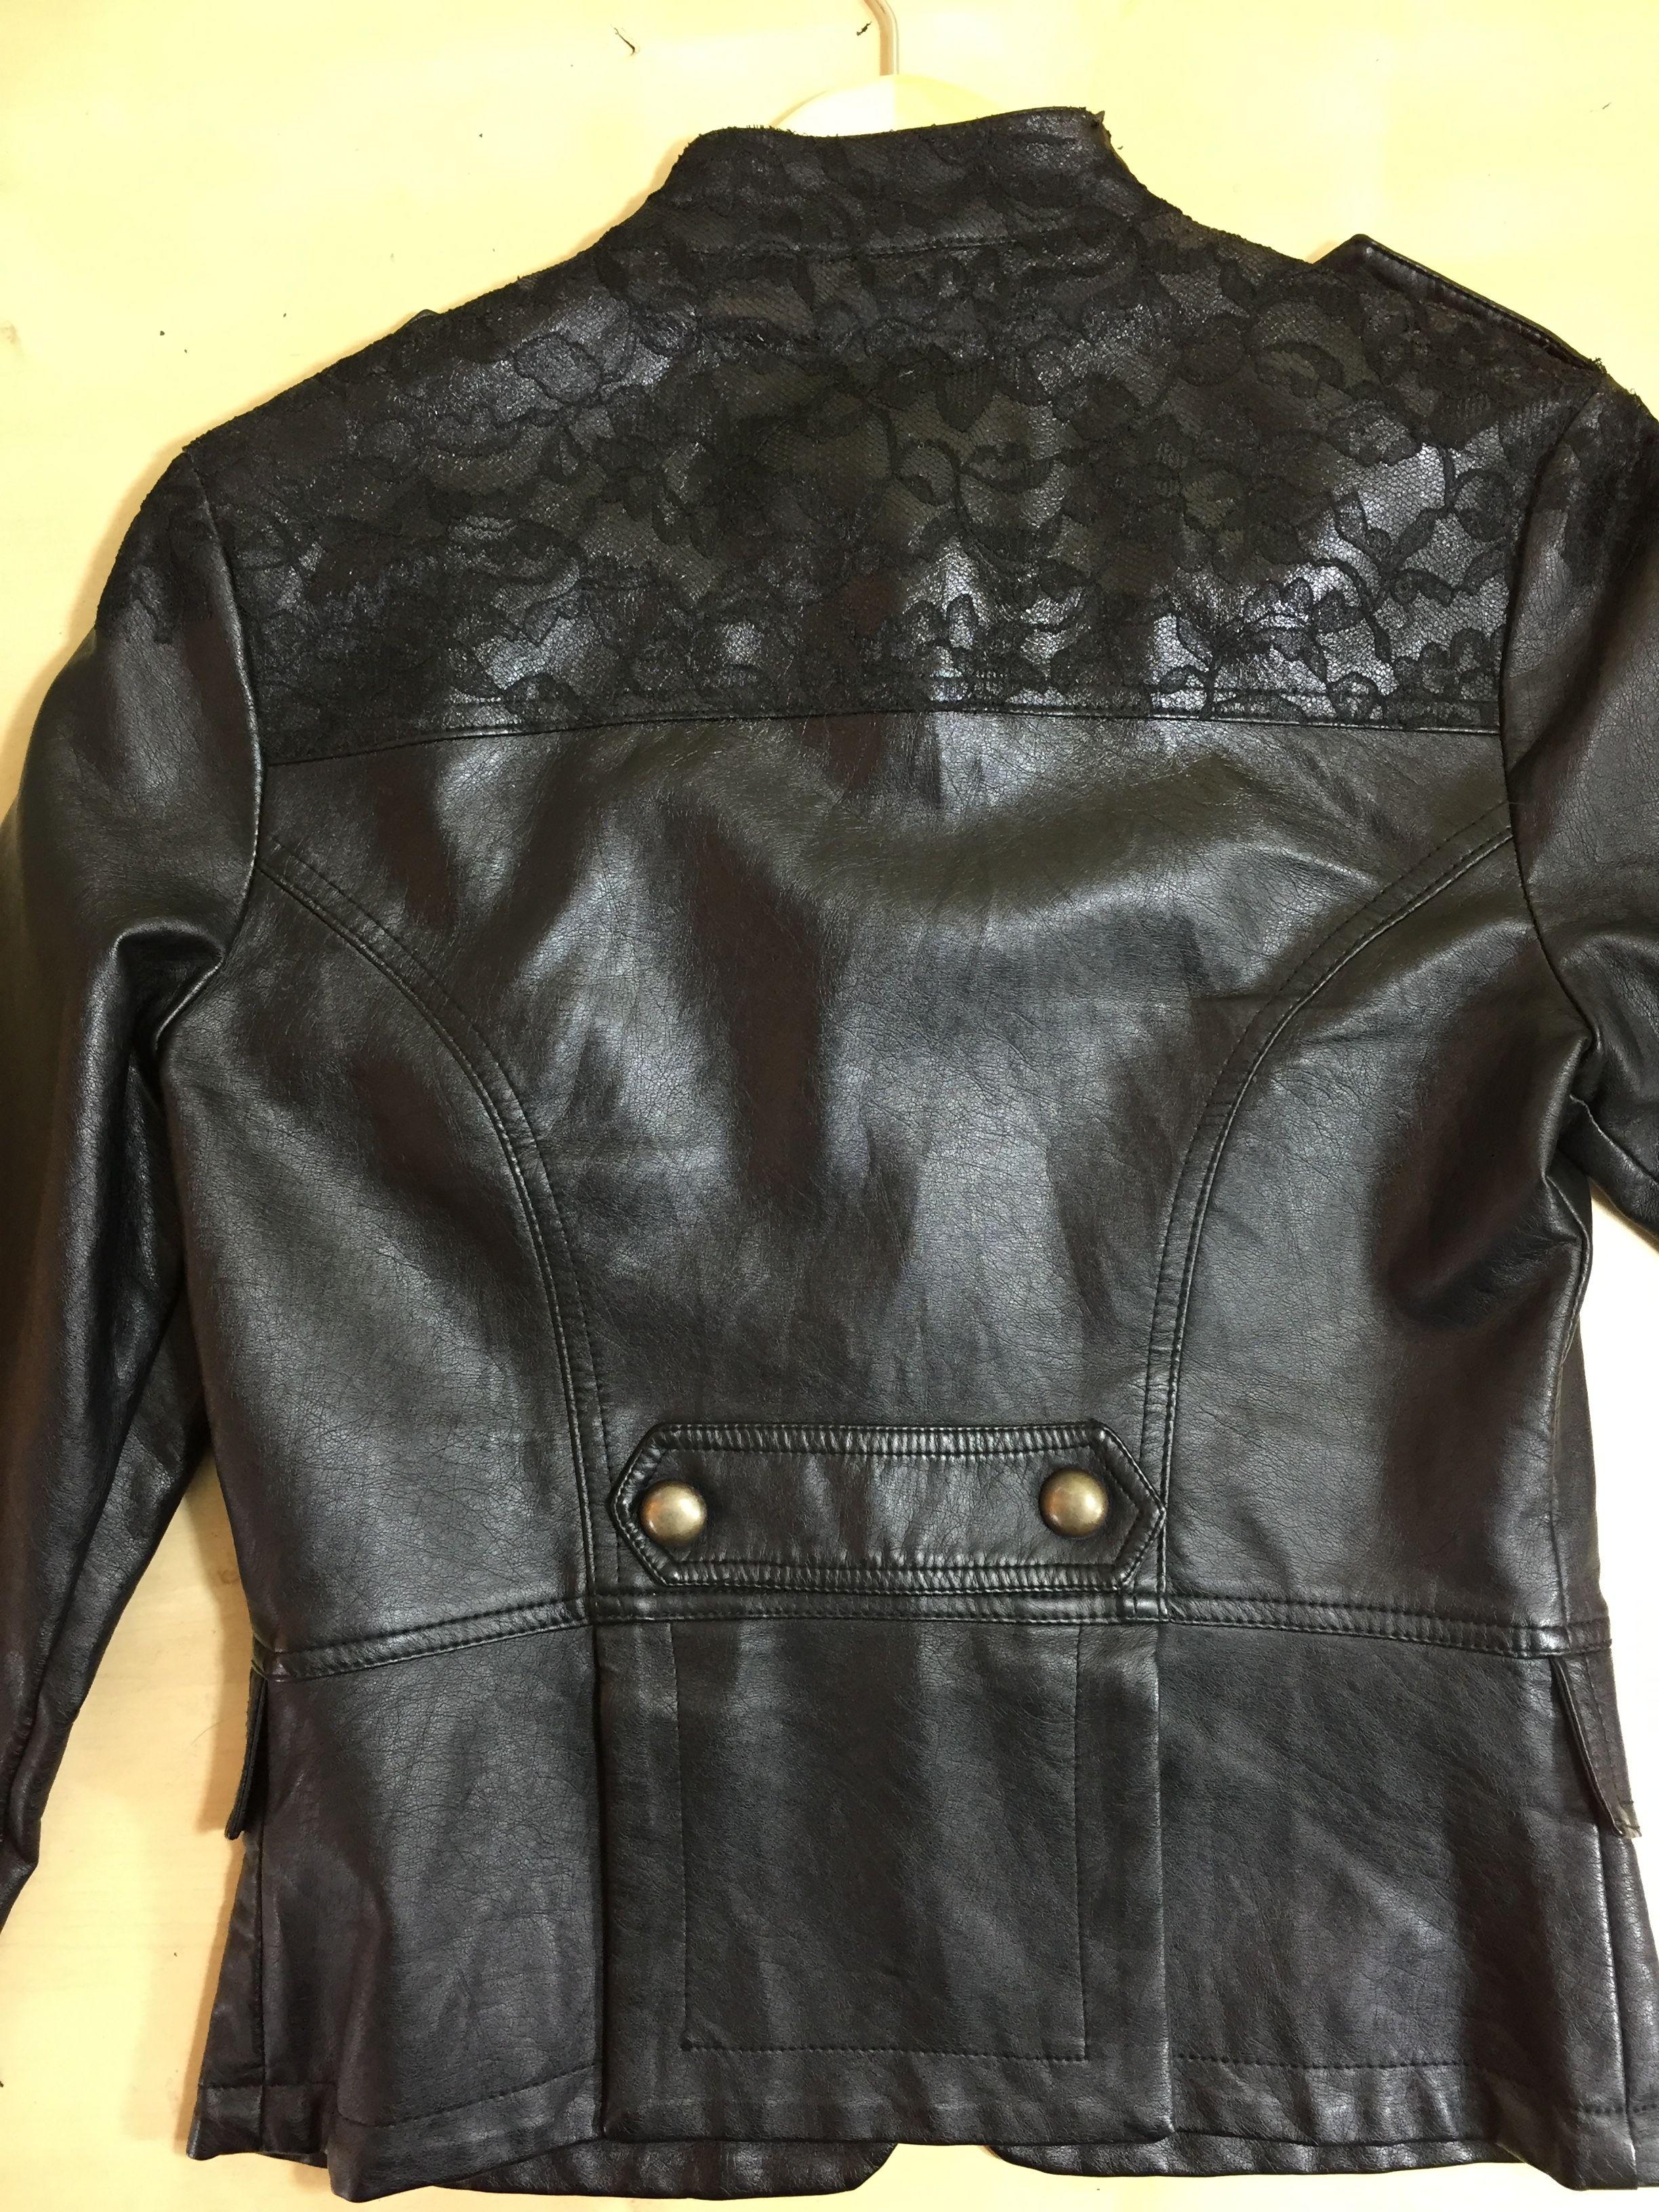 Jacket Repair Peeling Pleather Camouflaged With Lace Pleather Jacket Leather Jacket Repair Fake Leather Jacket [ 3264 x 2448 Pixel ]